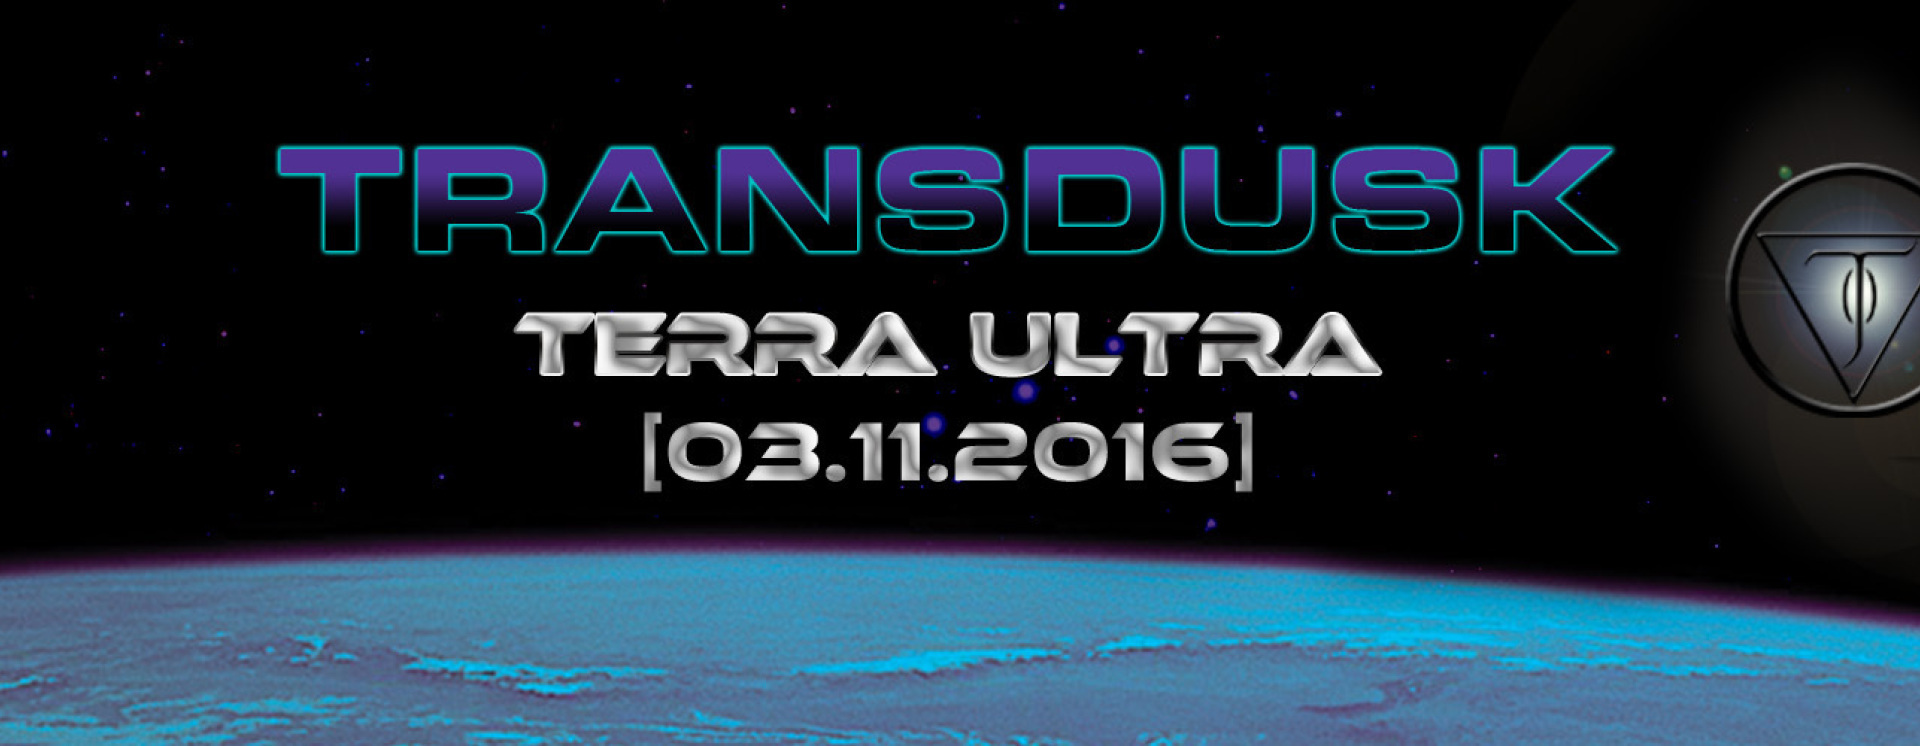 1452177091 terra ultra twitter cover pic release date copy